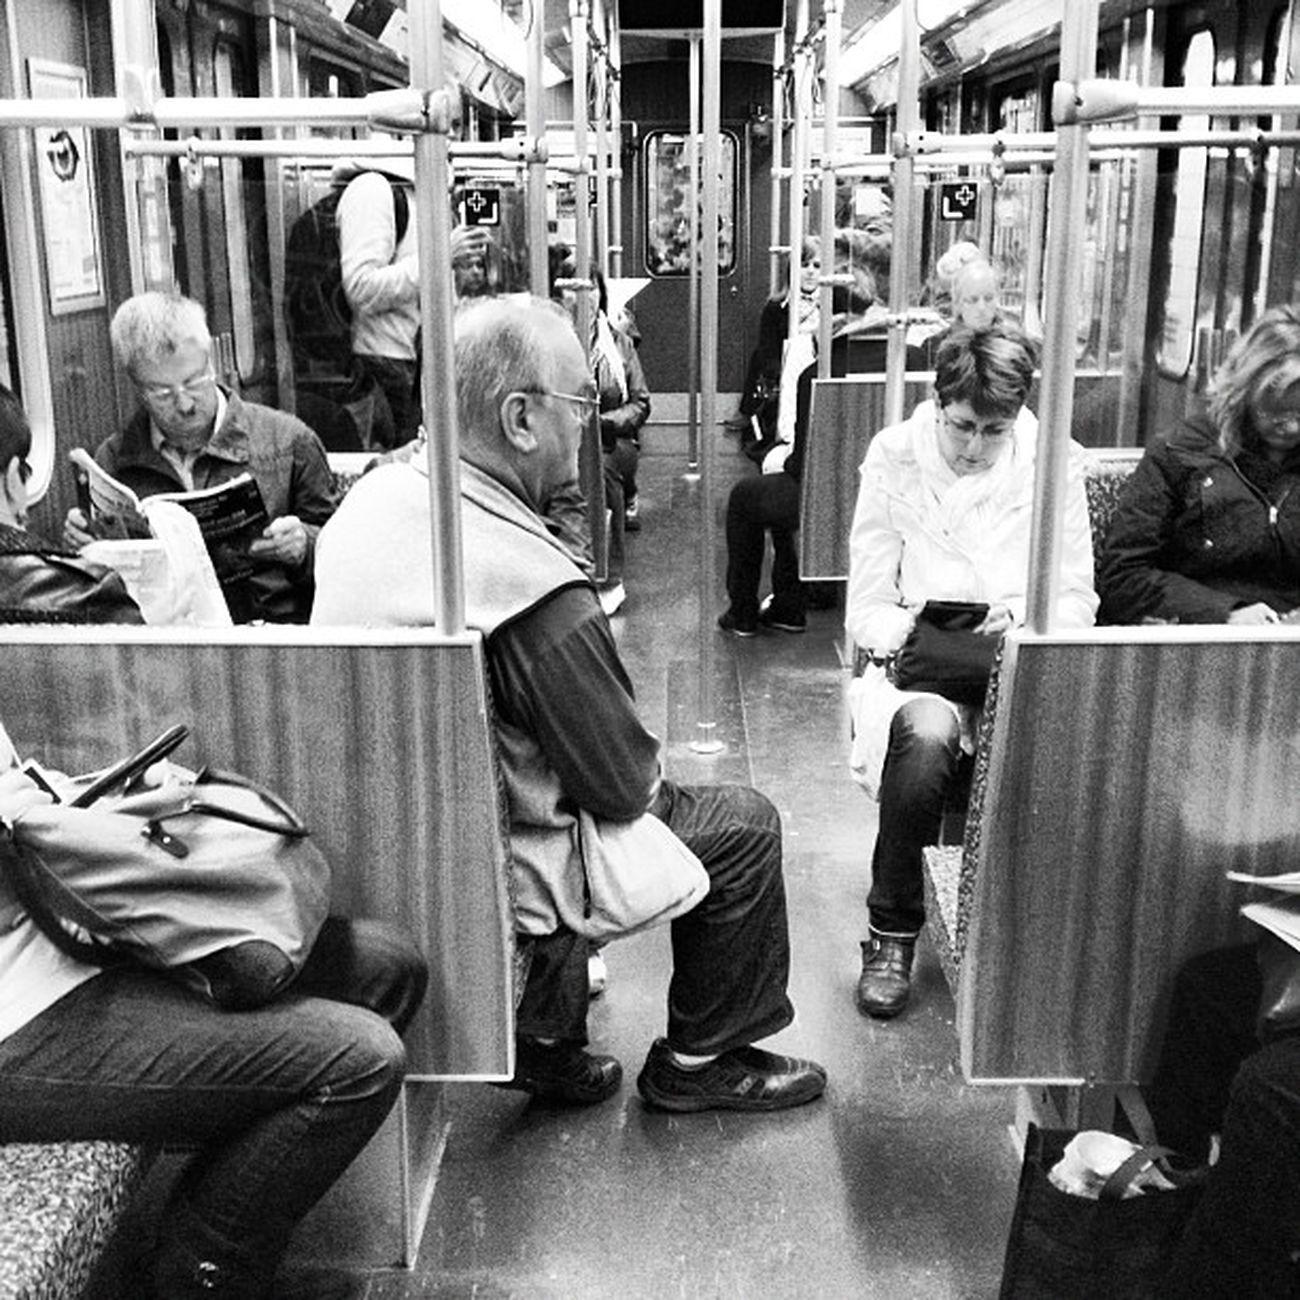 #subway #Berlin #igersberlin #instagood #tweegram #photooftheday #follow #instamod #igers #picoftheday #instragamhub #instadaily #insta_germany #bestoftheday #igdaily #webstagram #instragramers #ig_special #igersberlin #bw #blackandwhite #people Bestoftheday Igers IGDaily Tweegram Instagood Webstagram Instadaily Igersberlin People Insta_germany Berlin Instragramers Subway Ig_special Blackandwhite Instragamhub Bw Instamod Photooftheday Picoftheday Follow